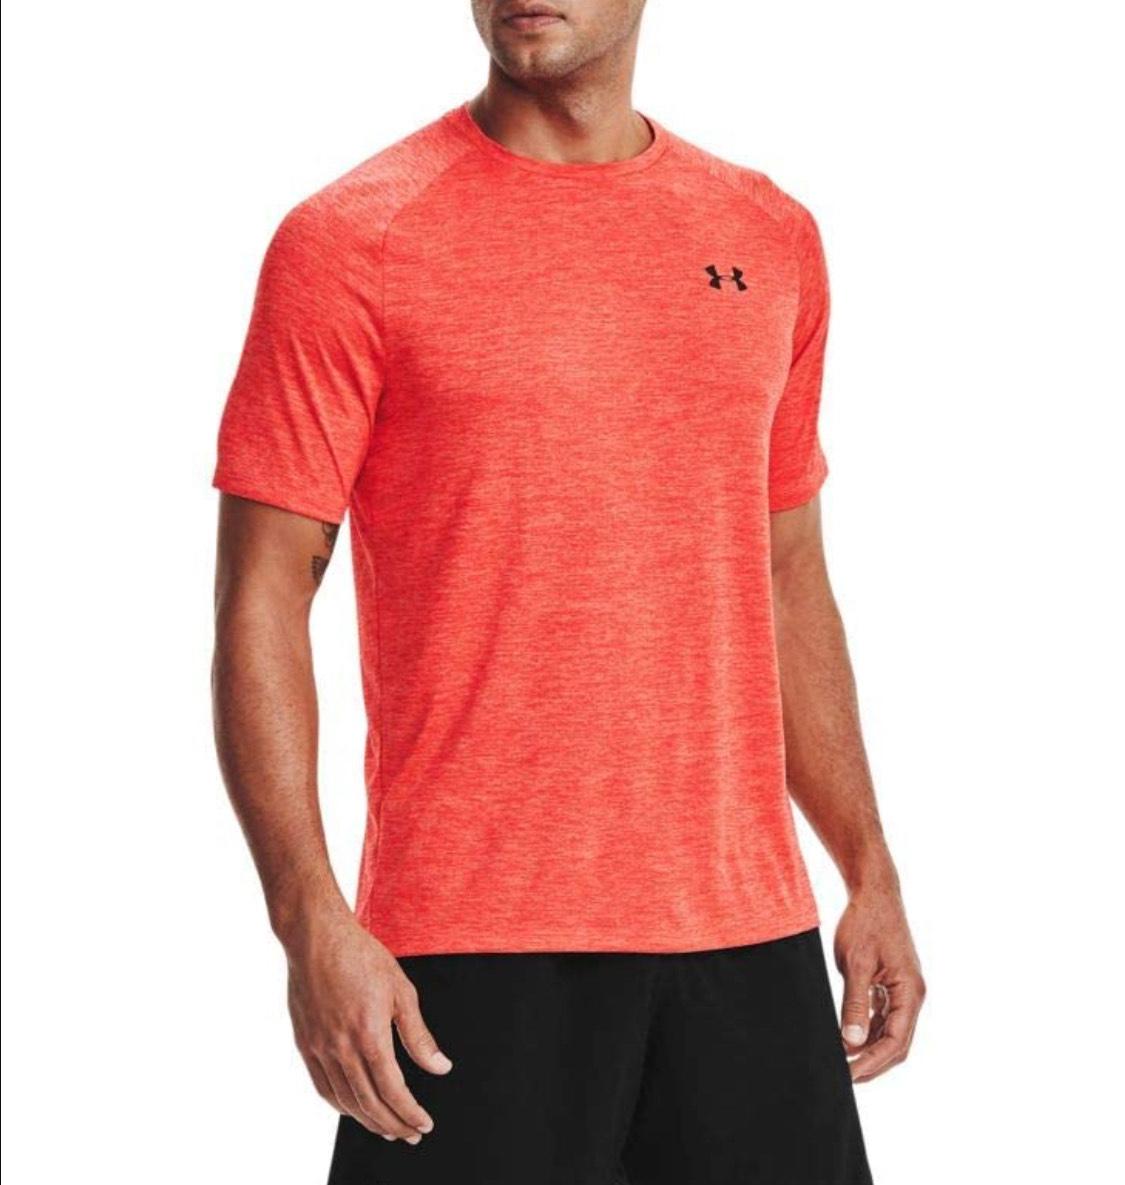 Camiseta deportiva Under Armour adulto talla M (28€ web oficial)